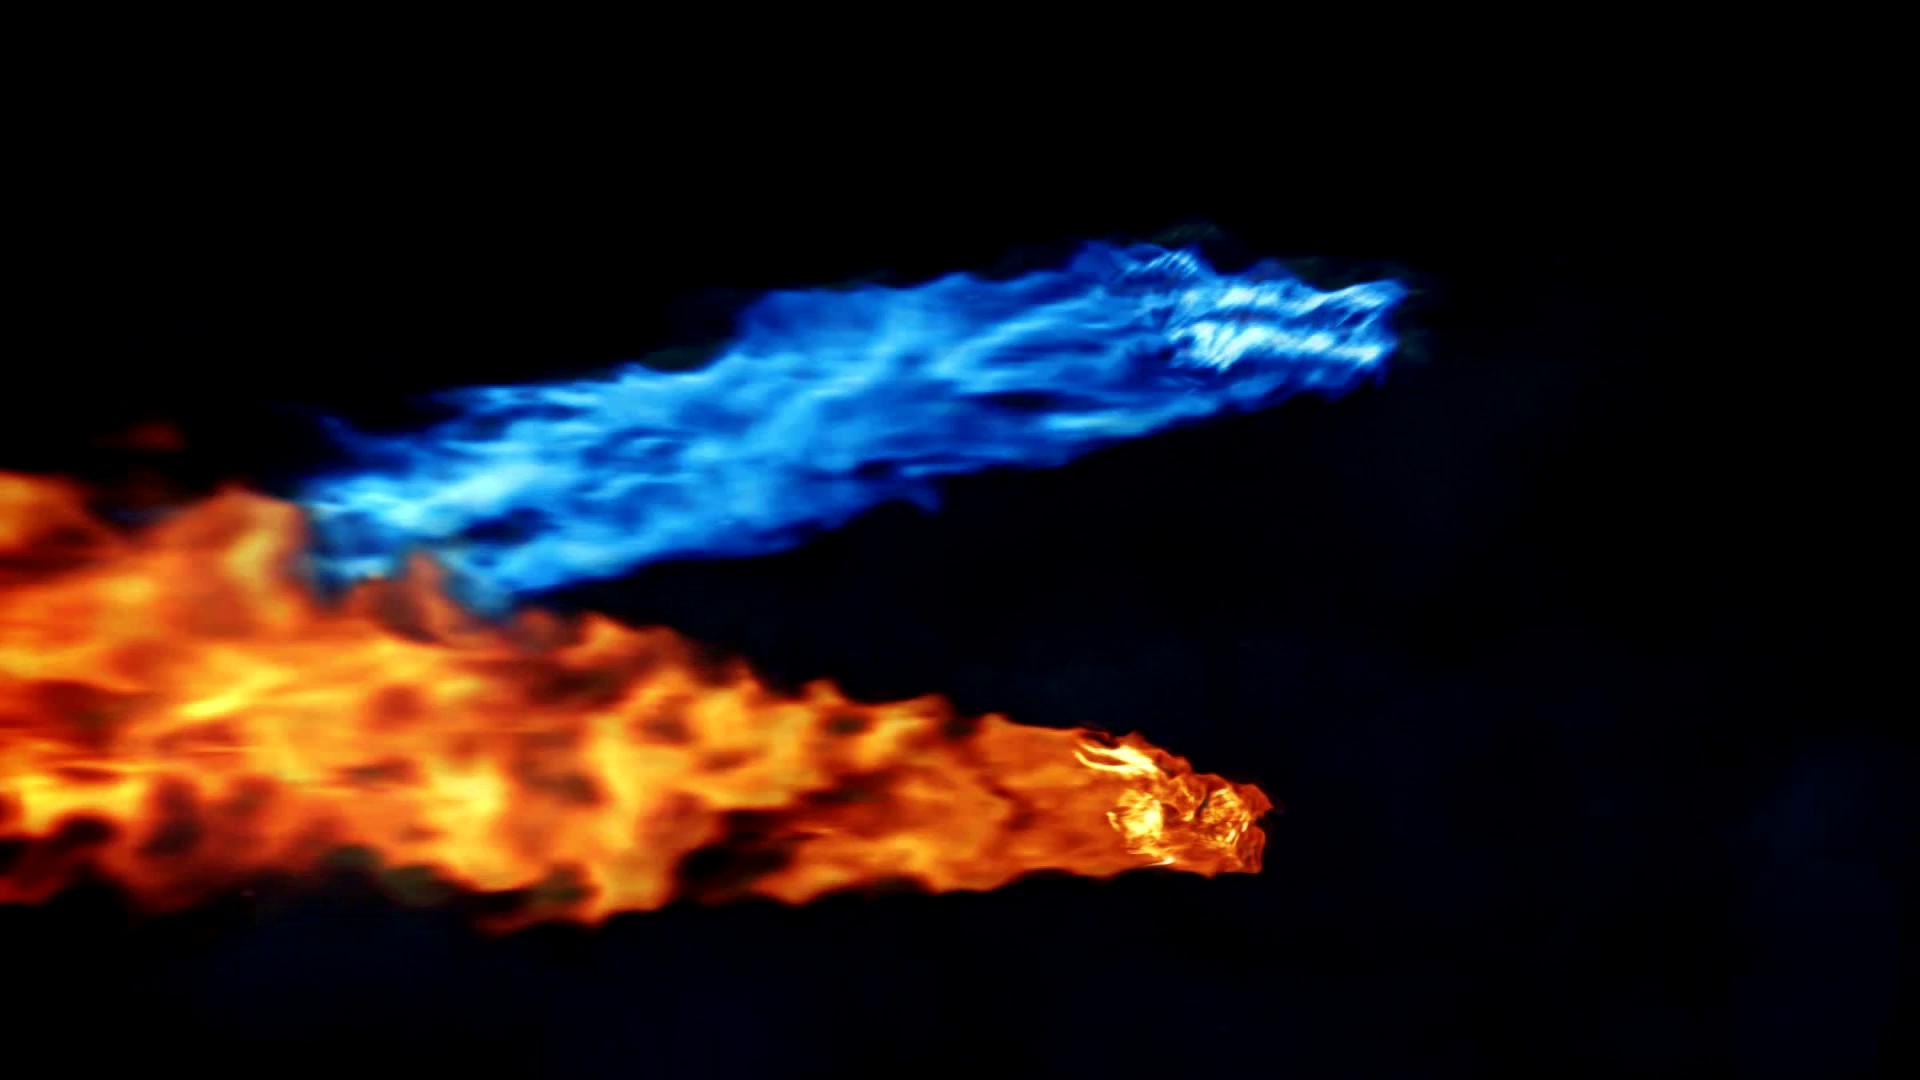 I Will Create Amazing Dragon Fire Logo Reveal Logo Reveal Fire Dragon Intro